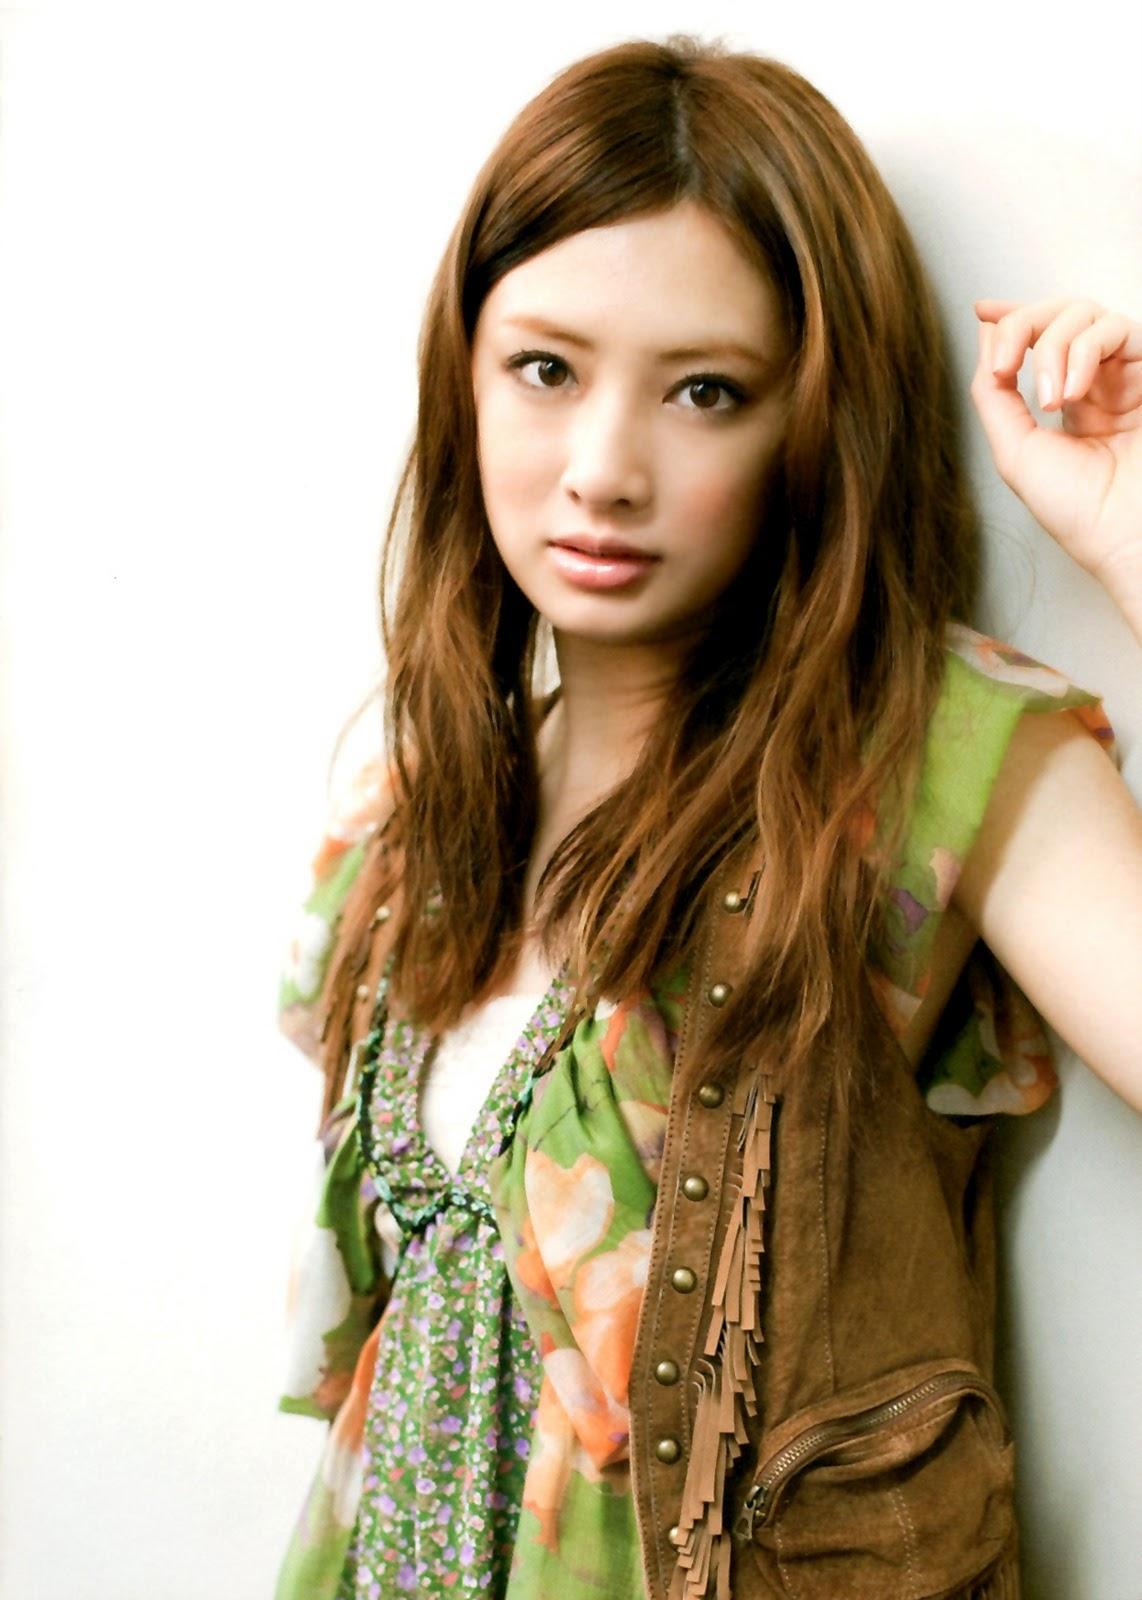 Keiko Kitagawa Japanese Actress Wallpaper